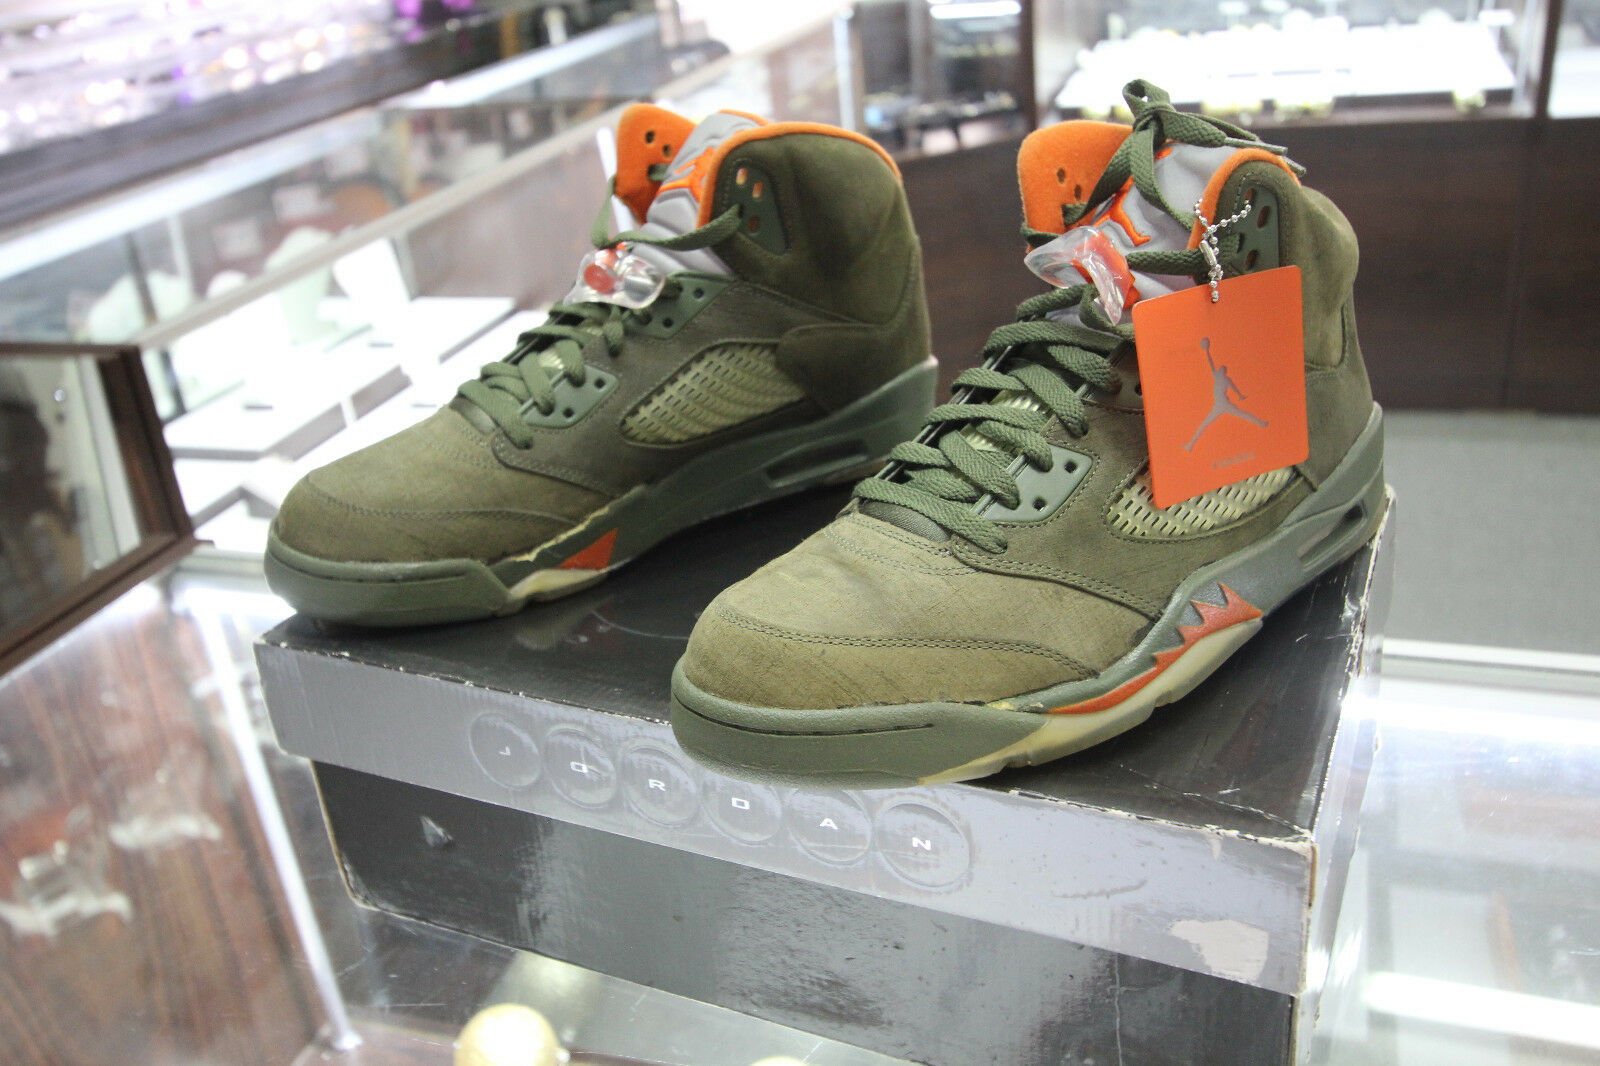 Nike Air Jordan V 5 De Retro Ejército Oliva Calzado De 5 Baloncesto De Colección 2018 [314259381]  11 b3b7f1